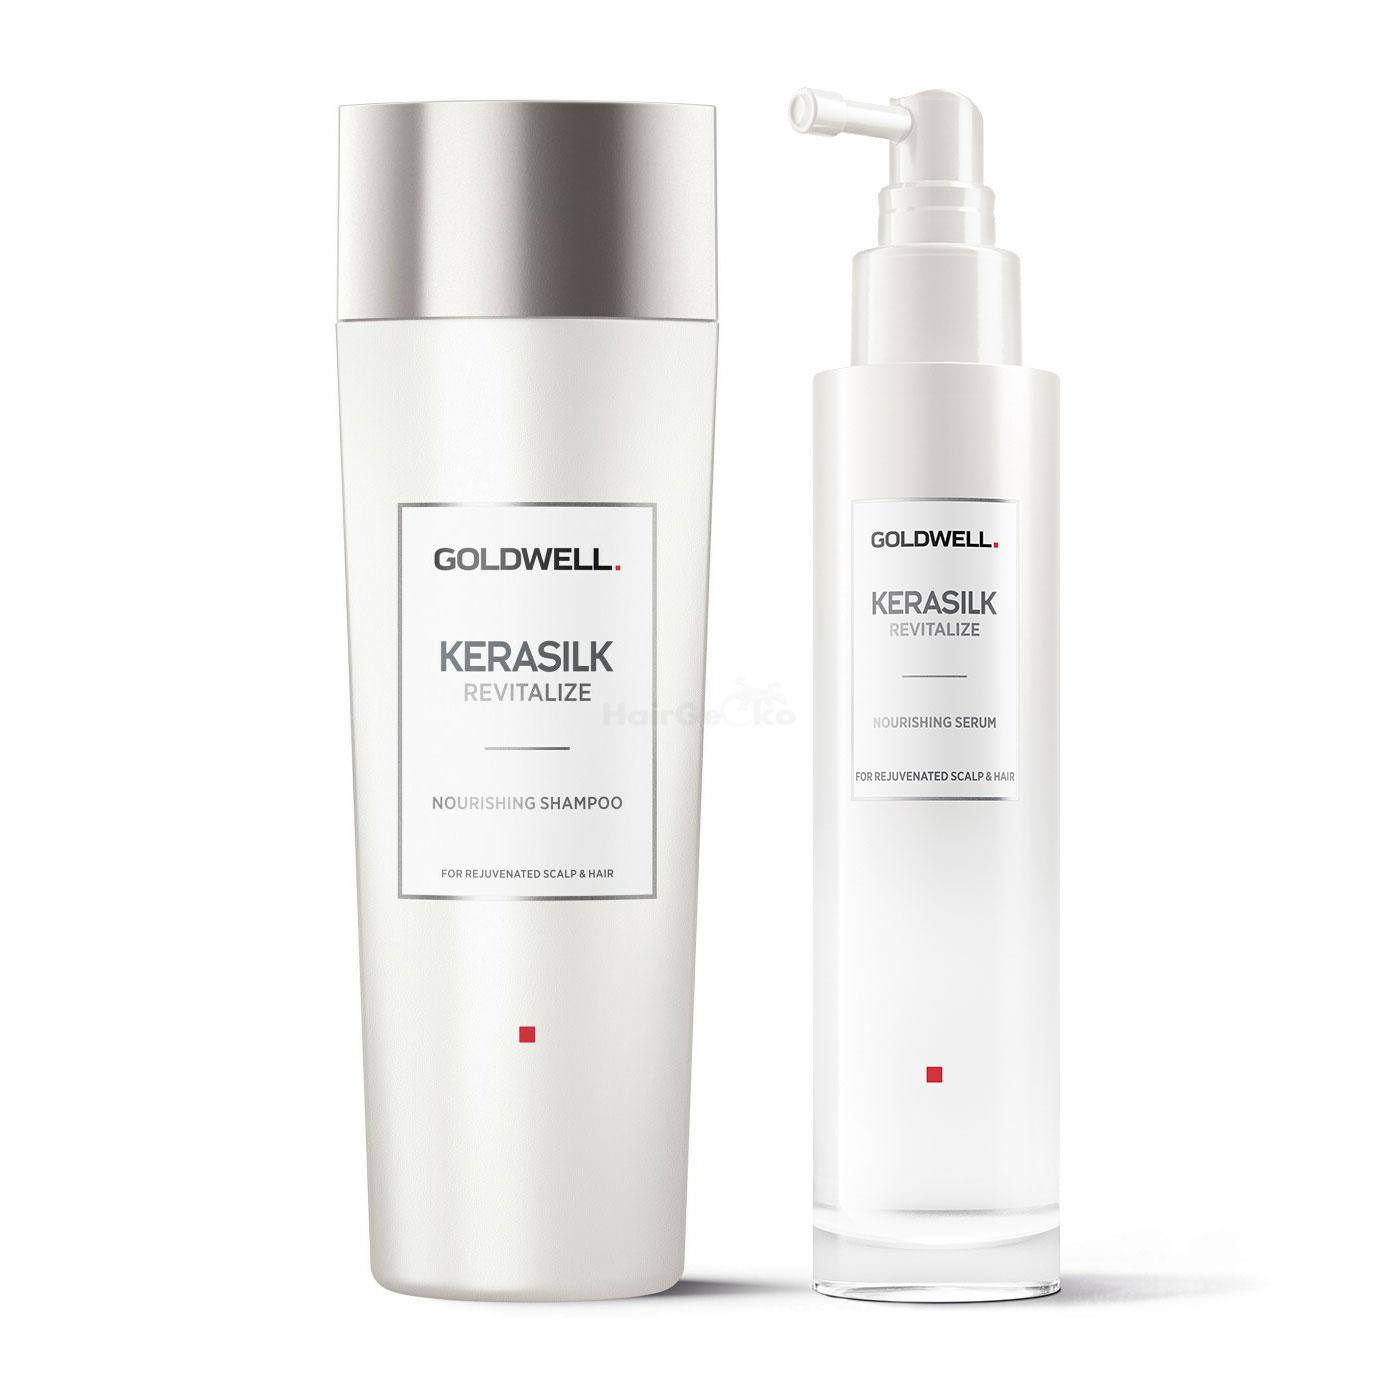 Goldwell Kerasilk Revitalize Nourishing nährendes Set - Shampoo 250ml + Serum 100ml